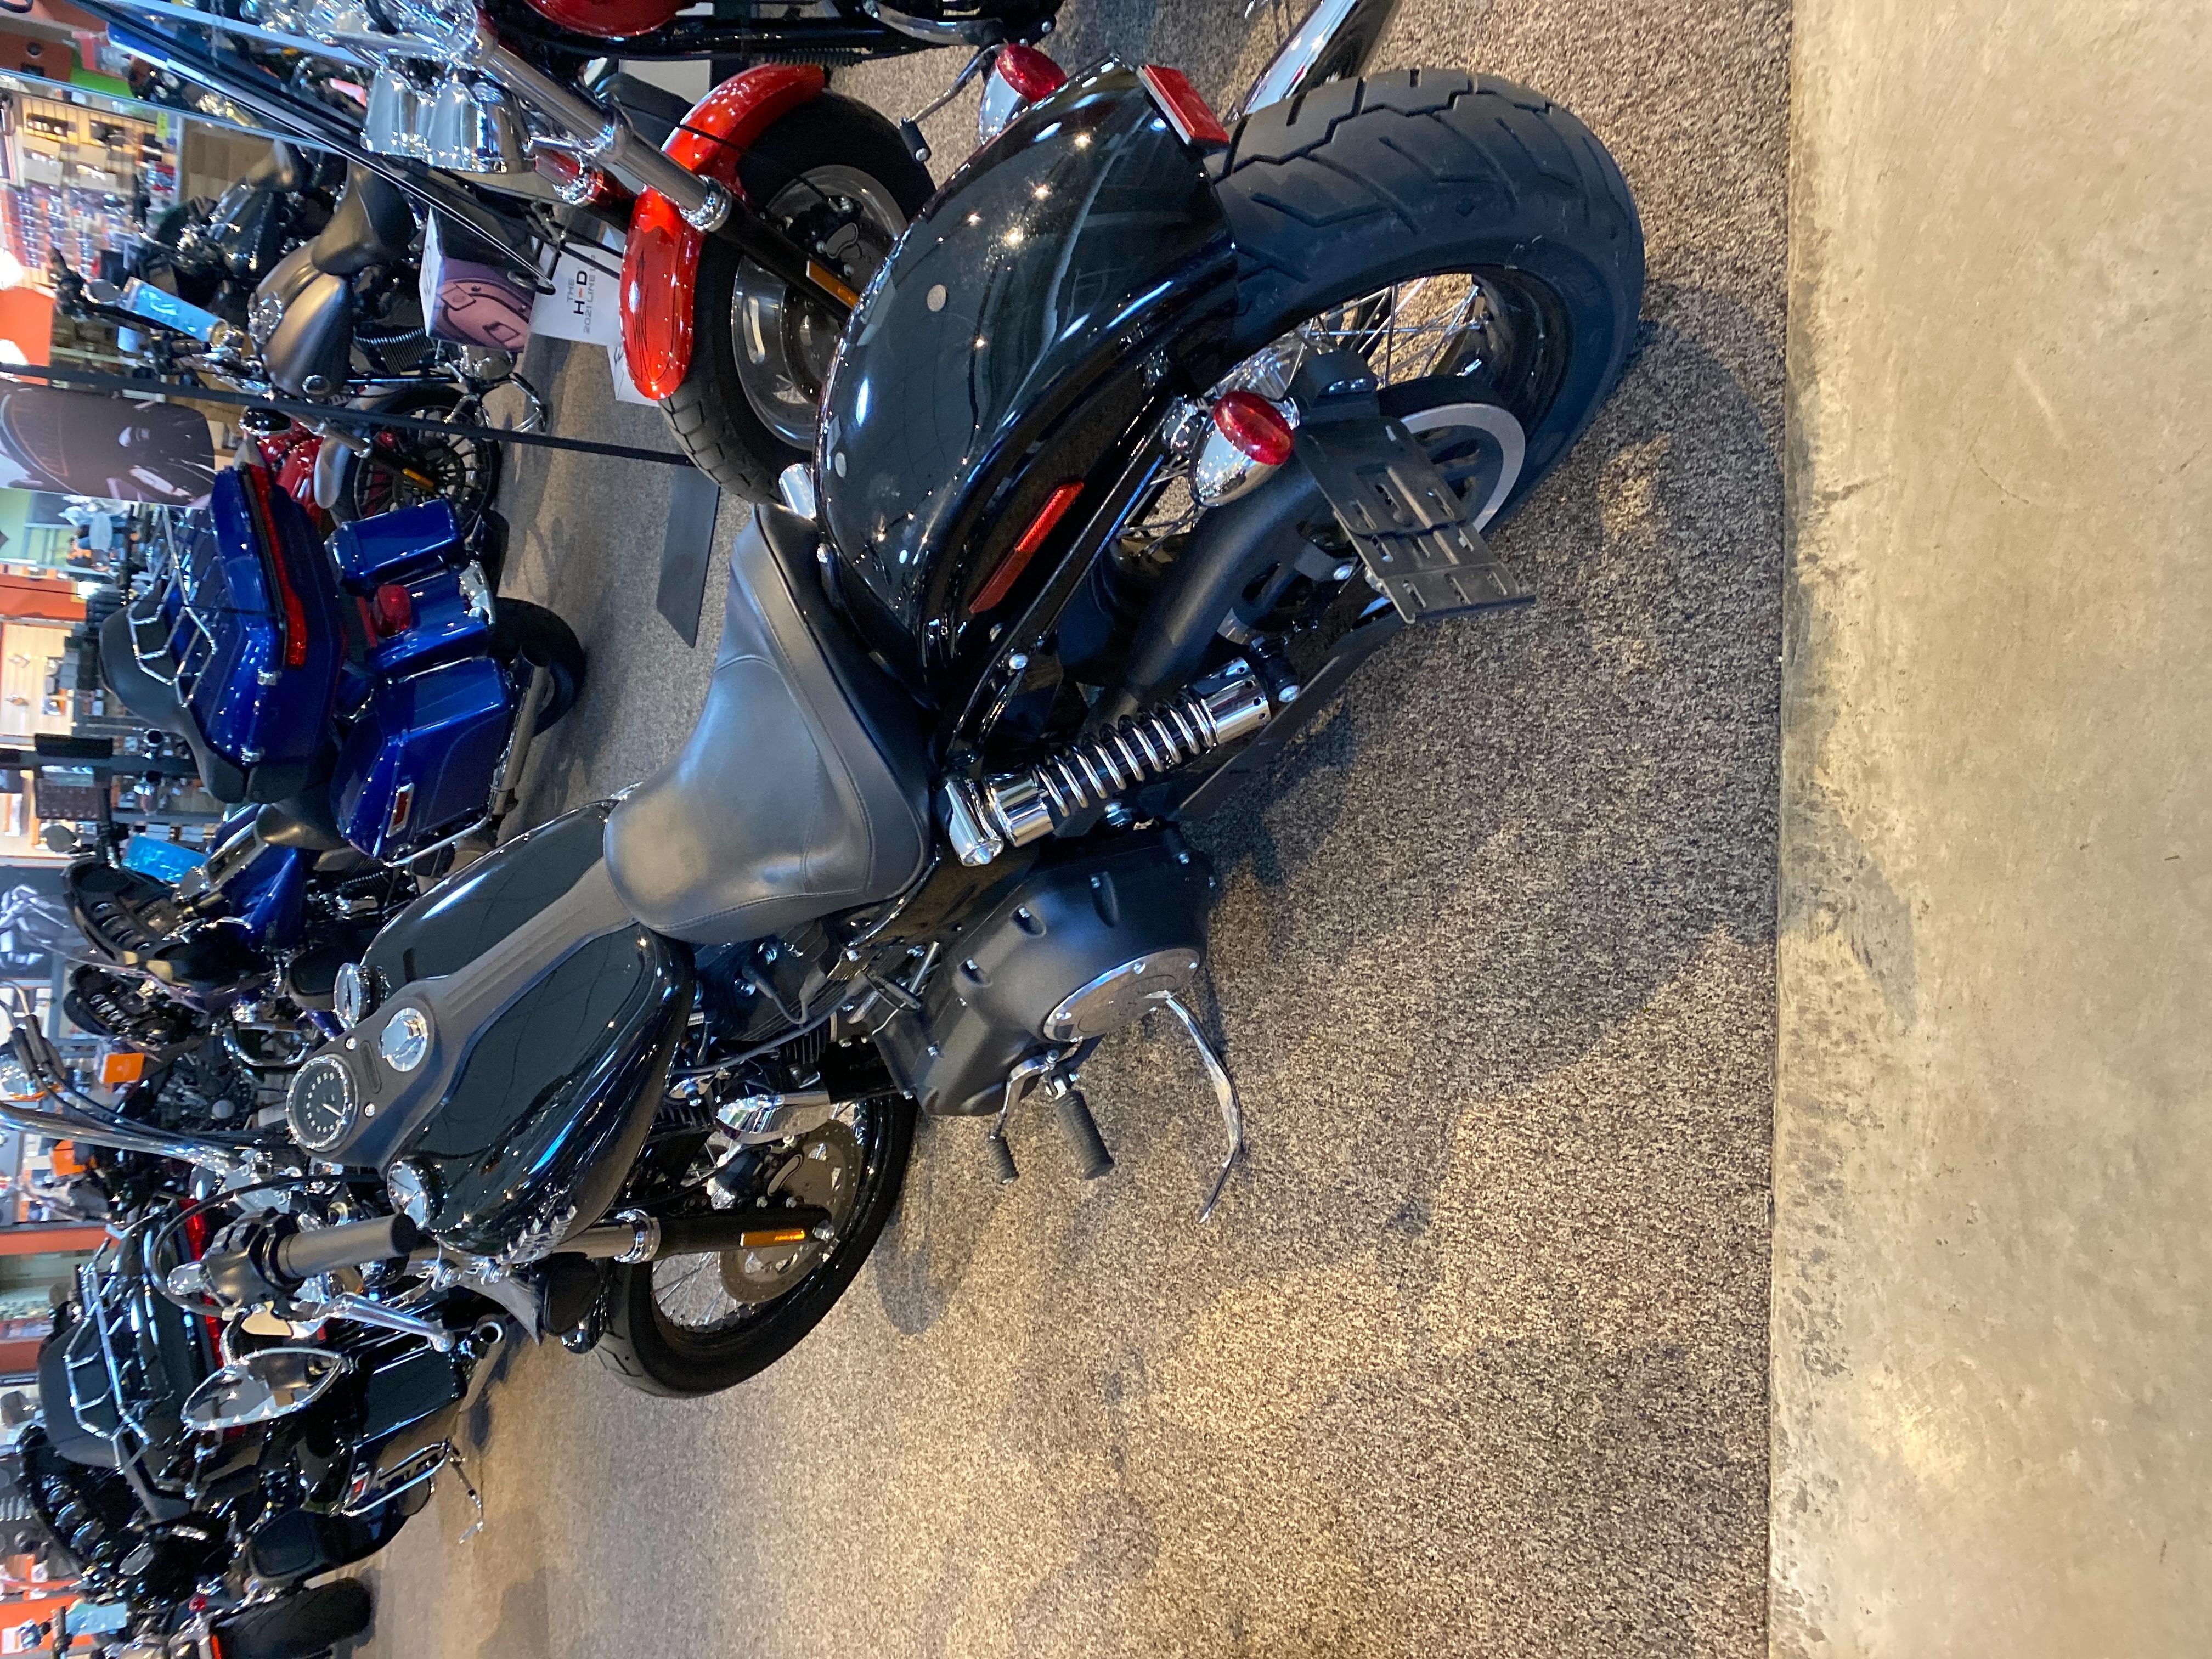 2017 Harley-Davidson Dyna Street Bob at Outpost Harley-Davidson